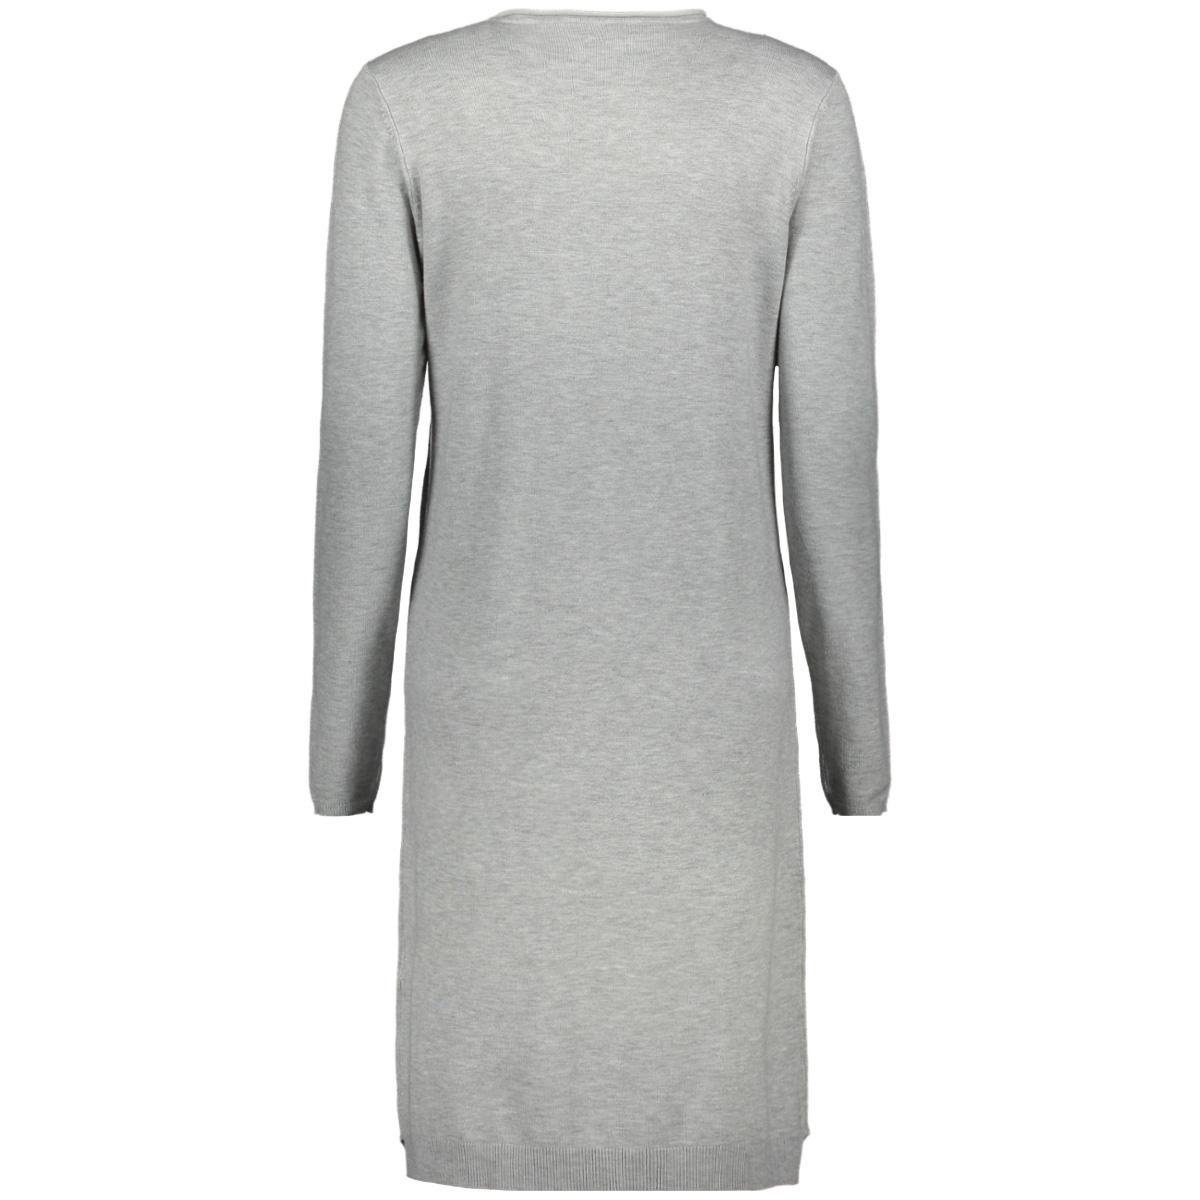 knit dress with pockets r6801 saint tropez jurk 0083